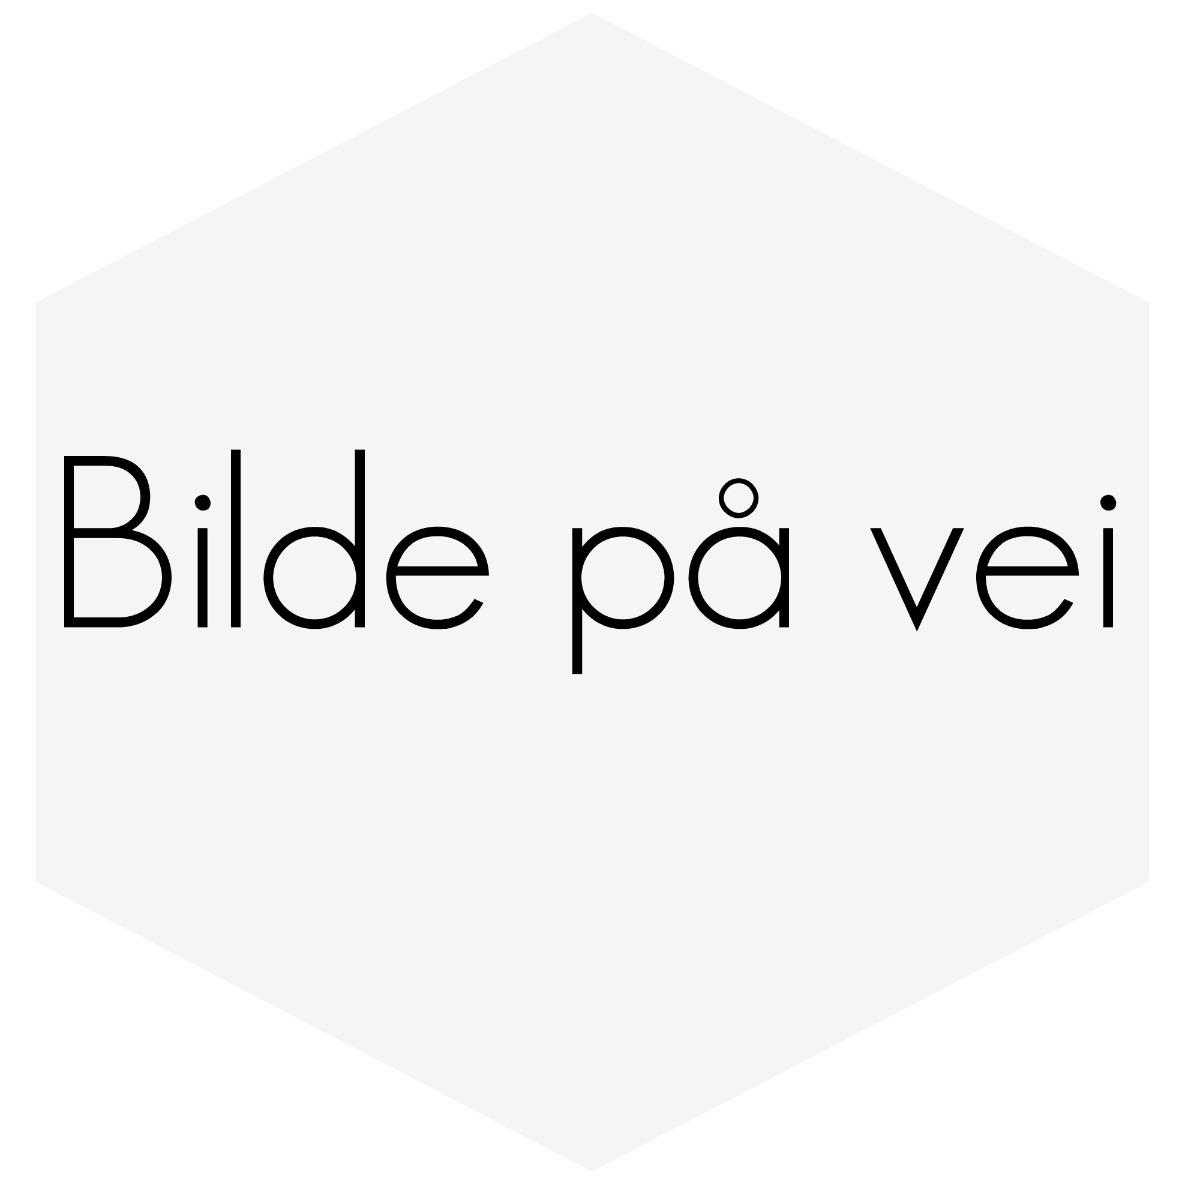 SILIKONSLANGE KIT VEIVHUS SLANGE. SORT VOLVO 940 92-98